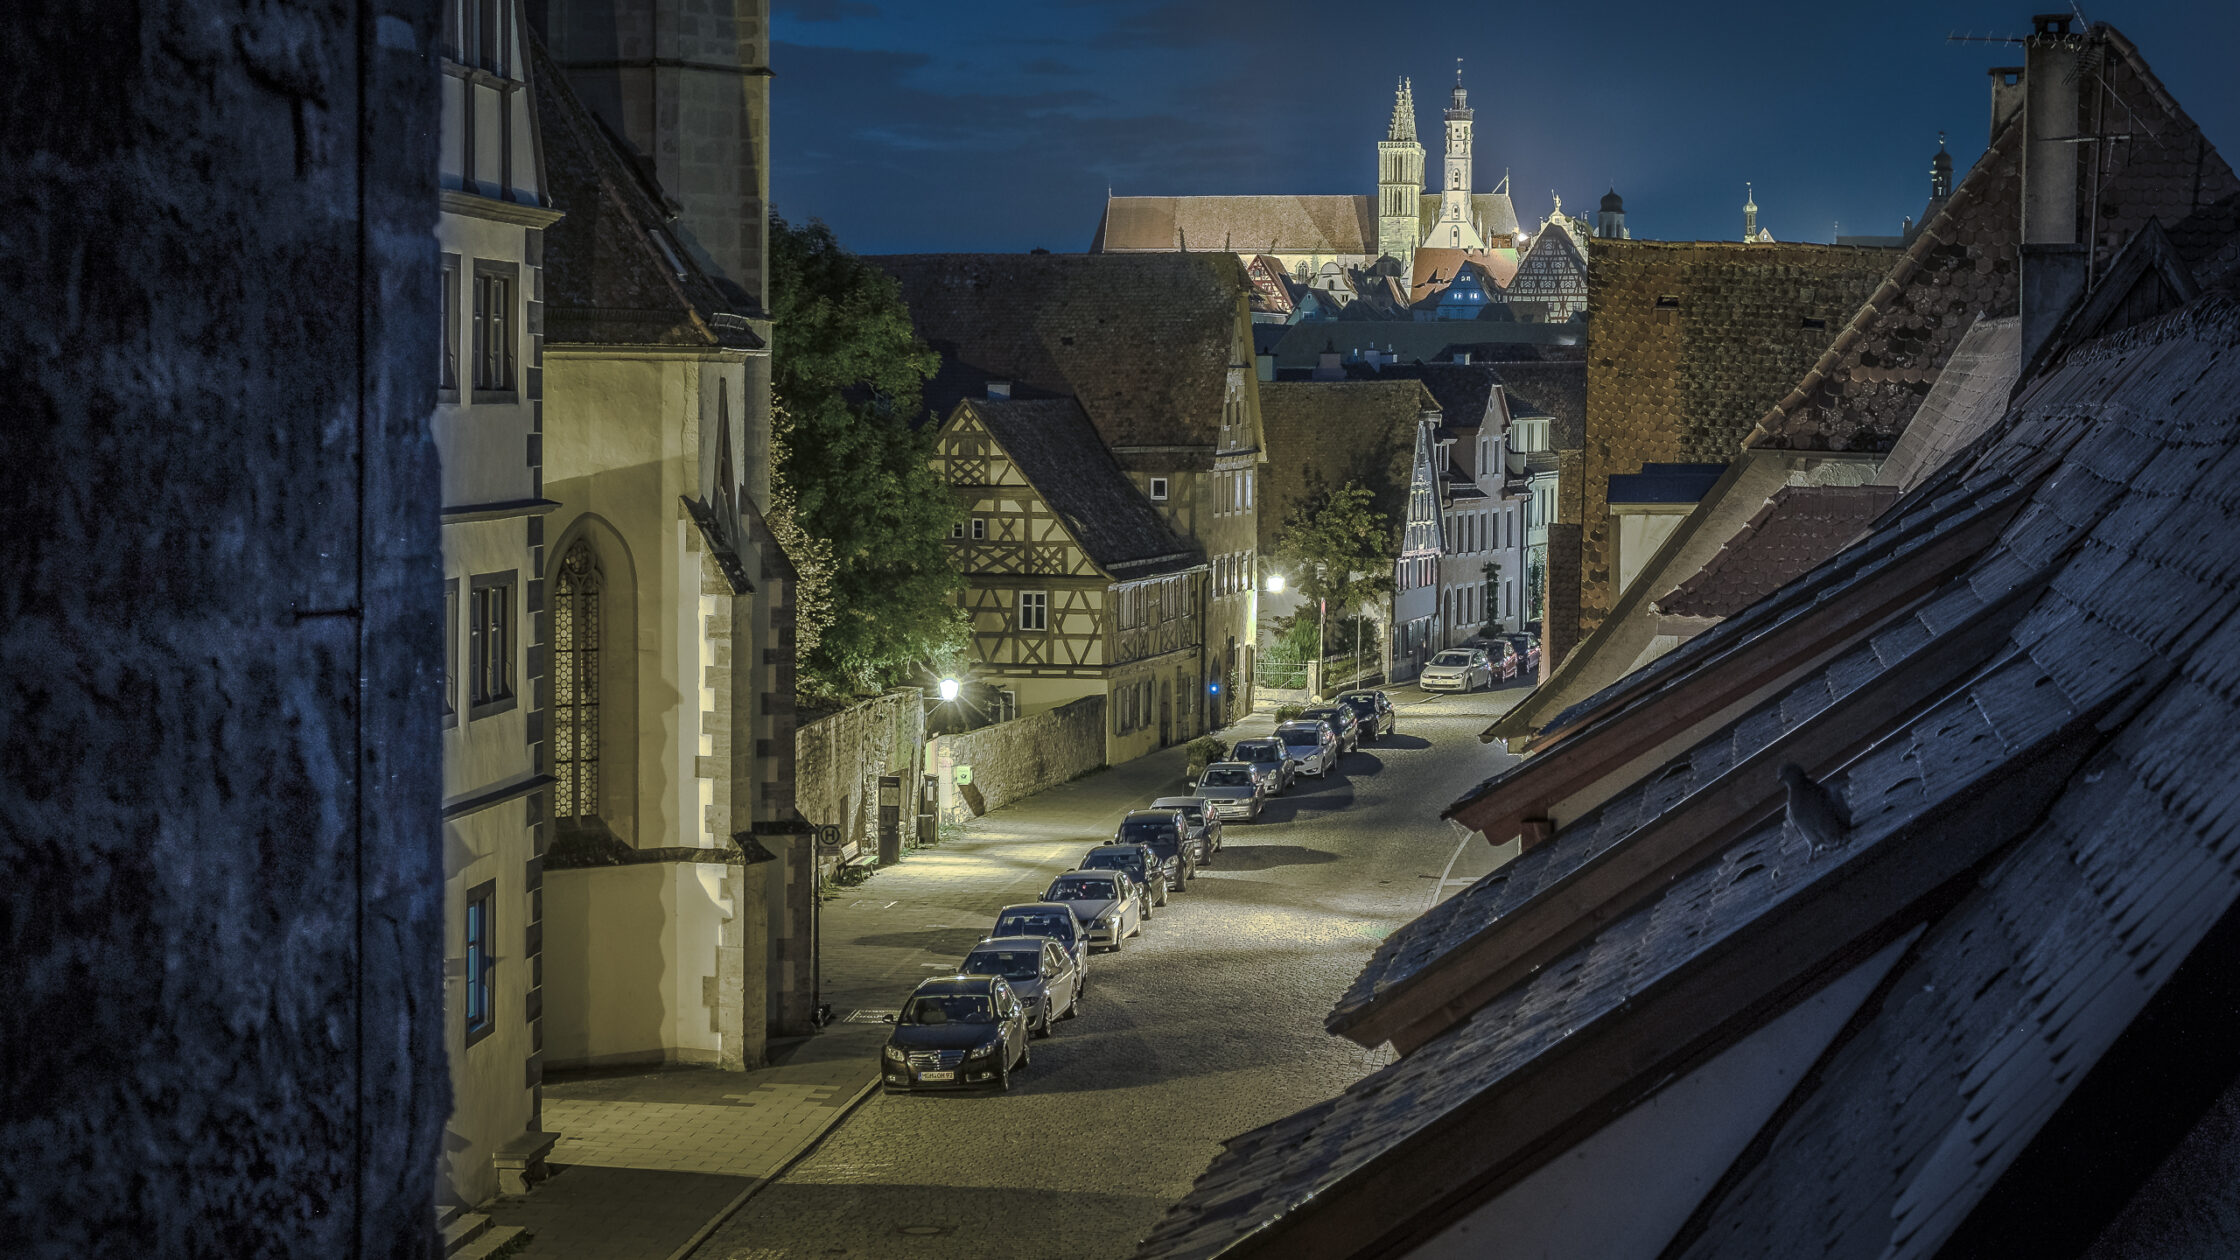 Spitalgasse Rothenburg ob der Tauber / 20170929200406